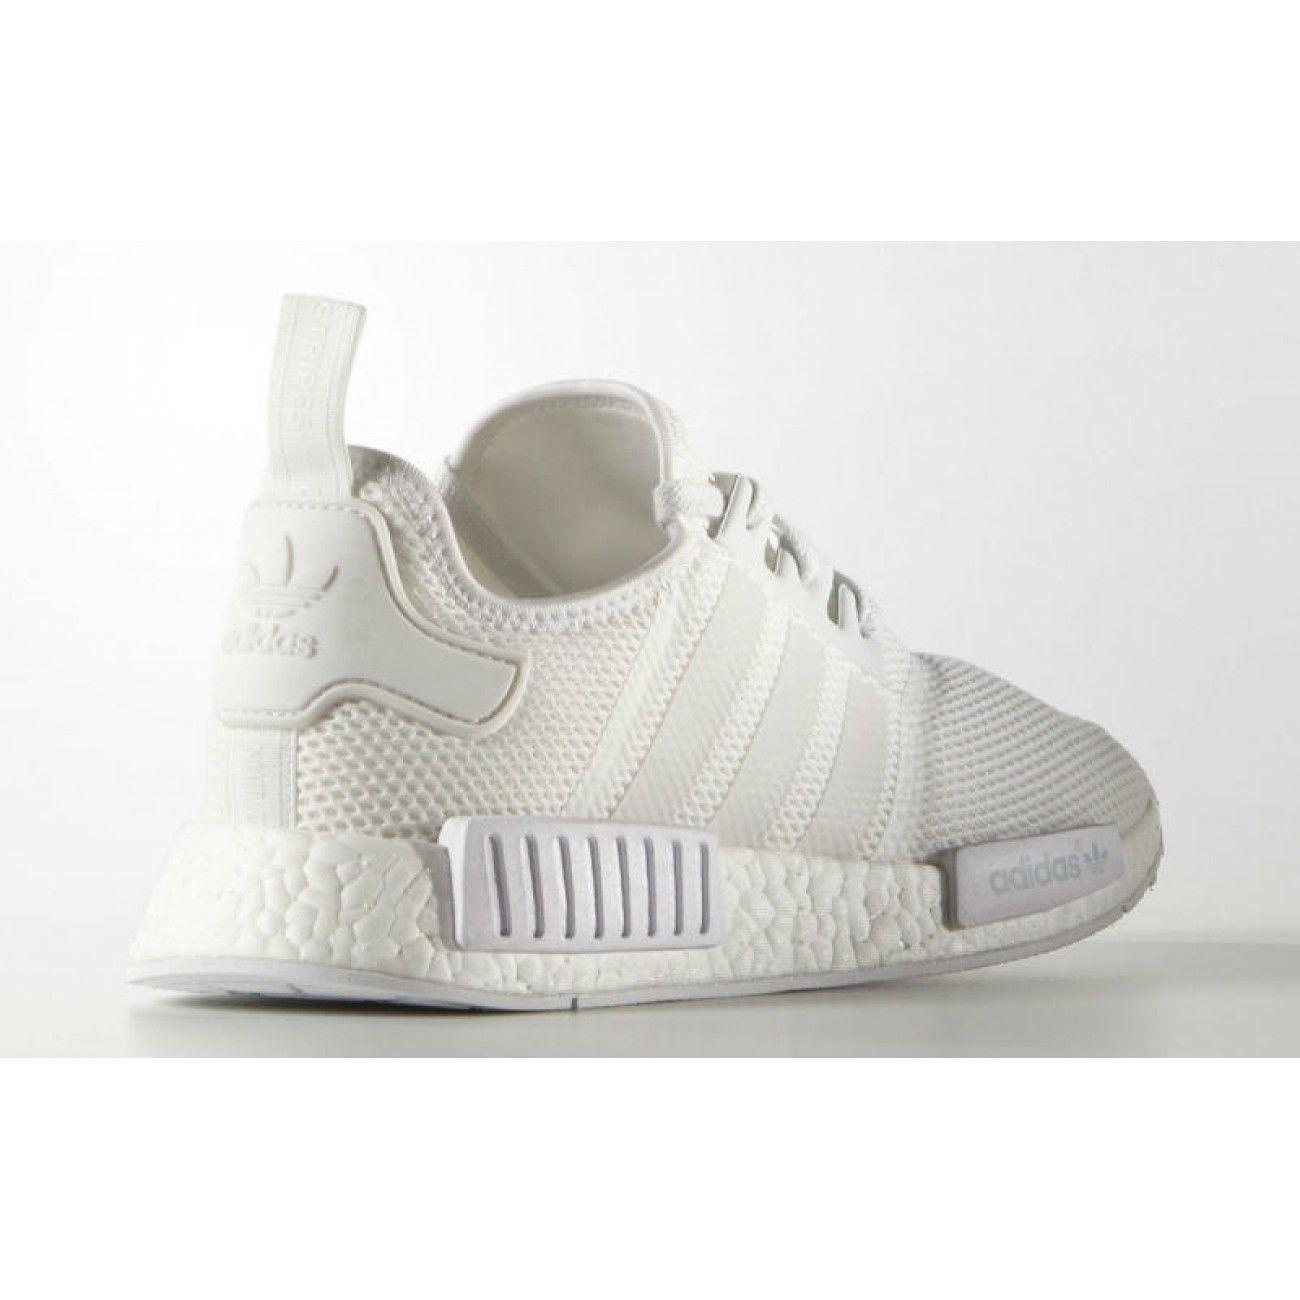 adidas nmd runner triplo white nmd, adidas nmd e adidas